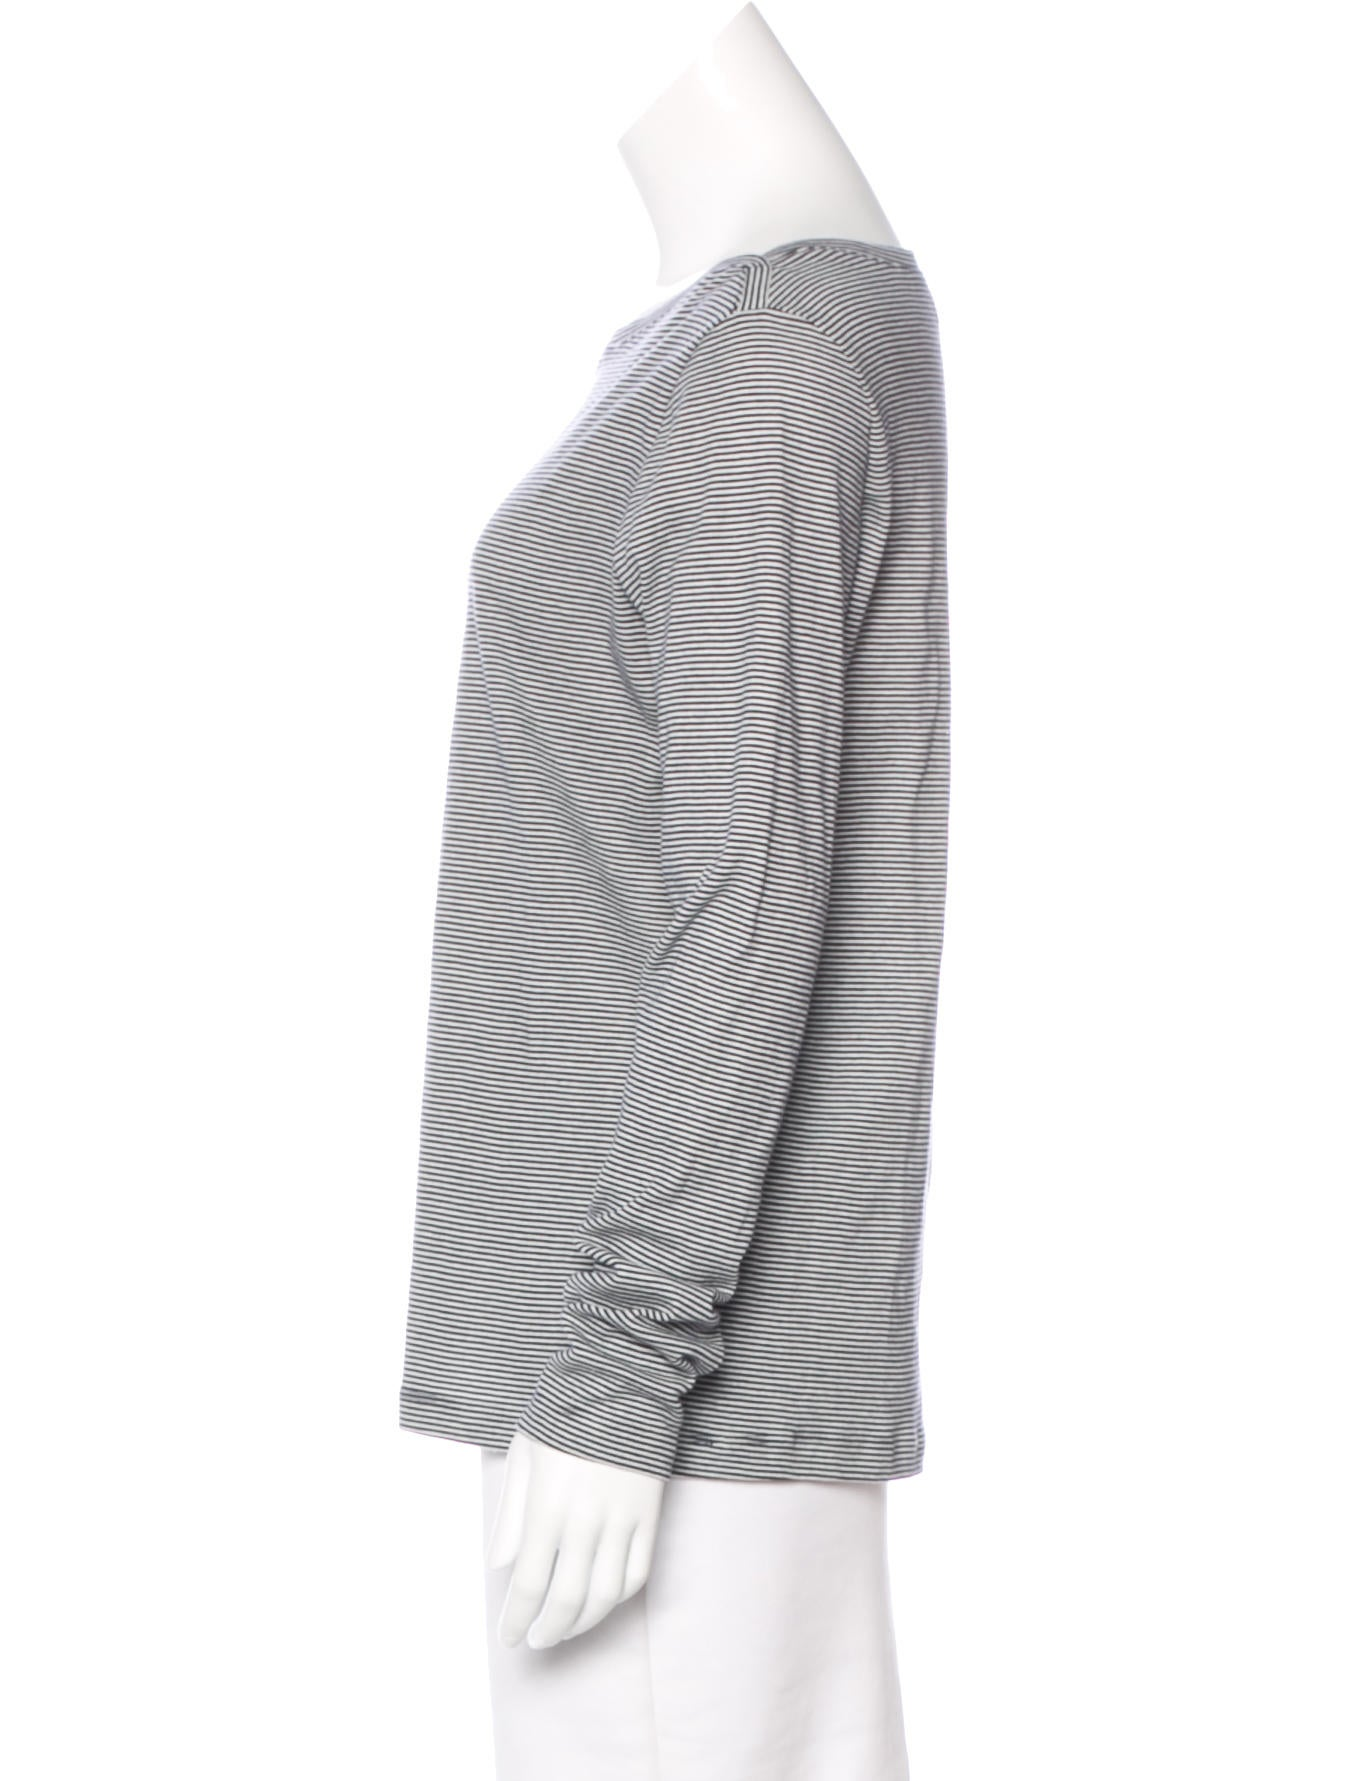 Petit bateau striped knit top clothing wpeti20756 for Petit bateau striped shirt